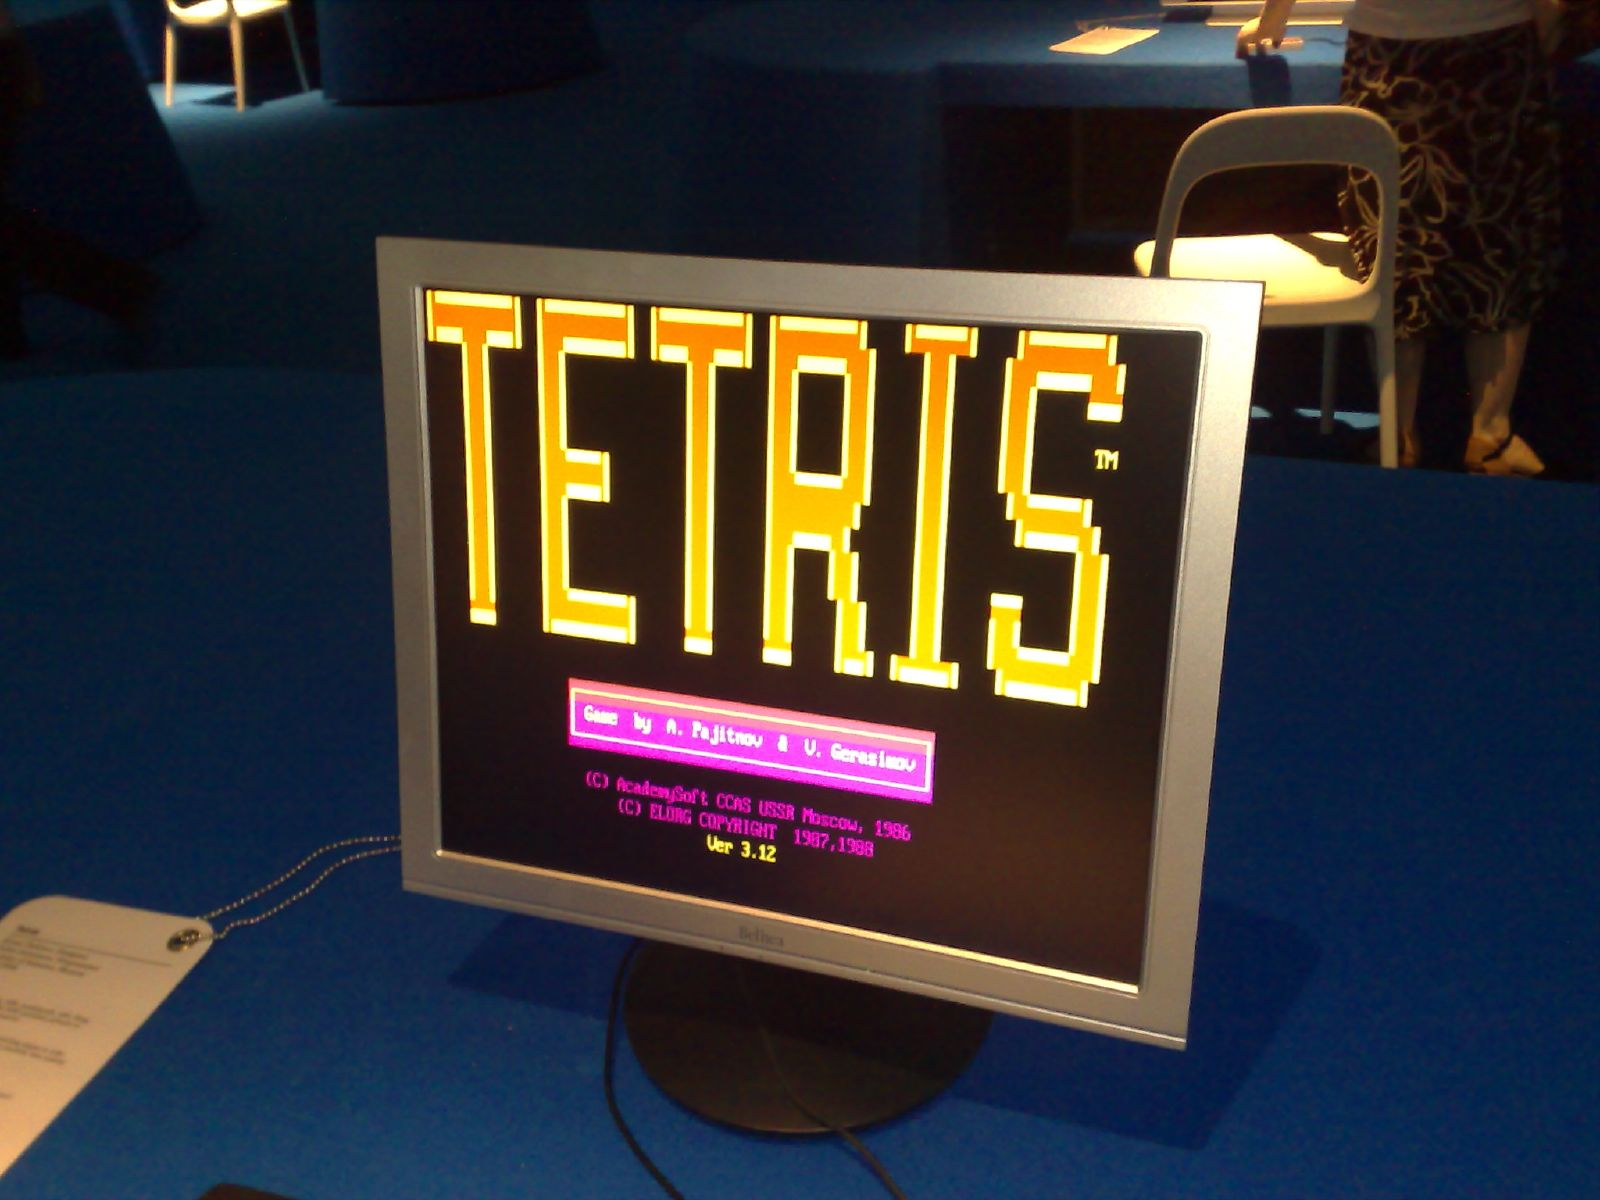 File:Home screen Tetris IBM.jpg - Wikimedia Commons